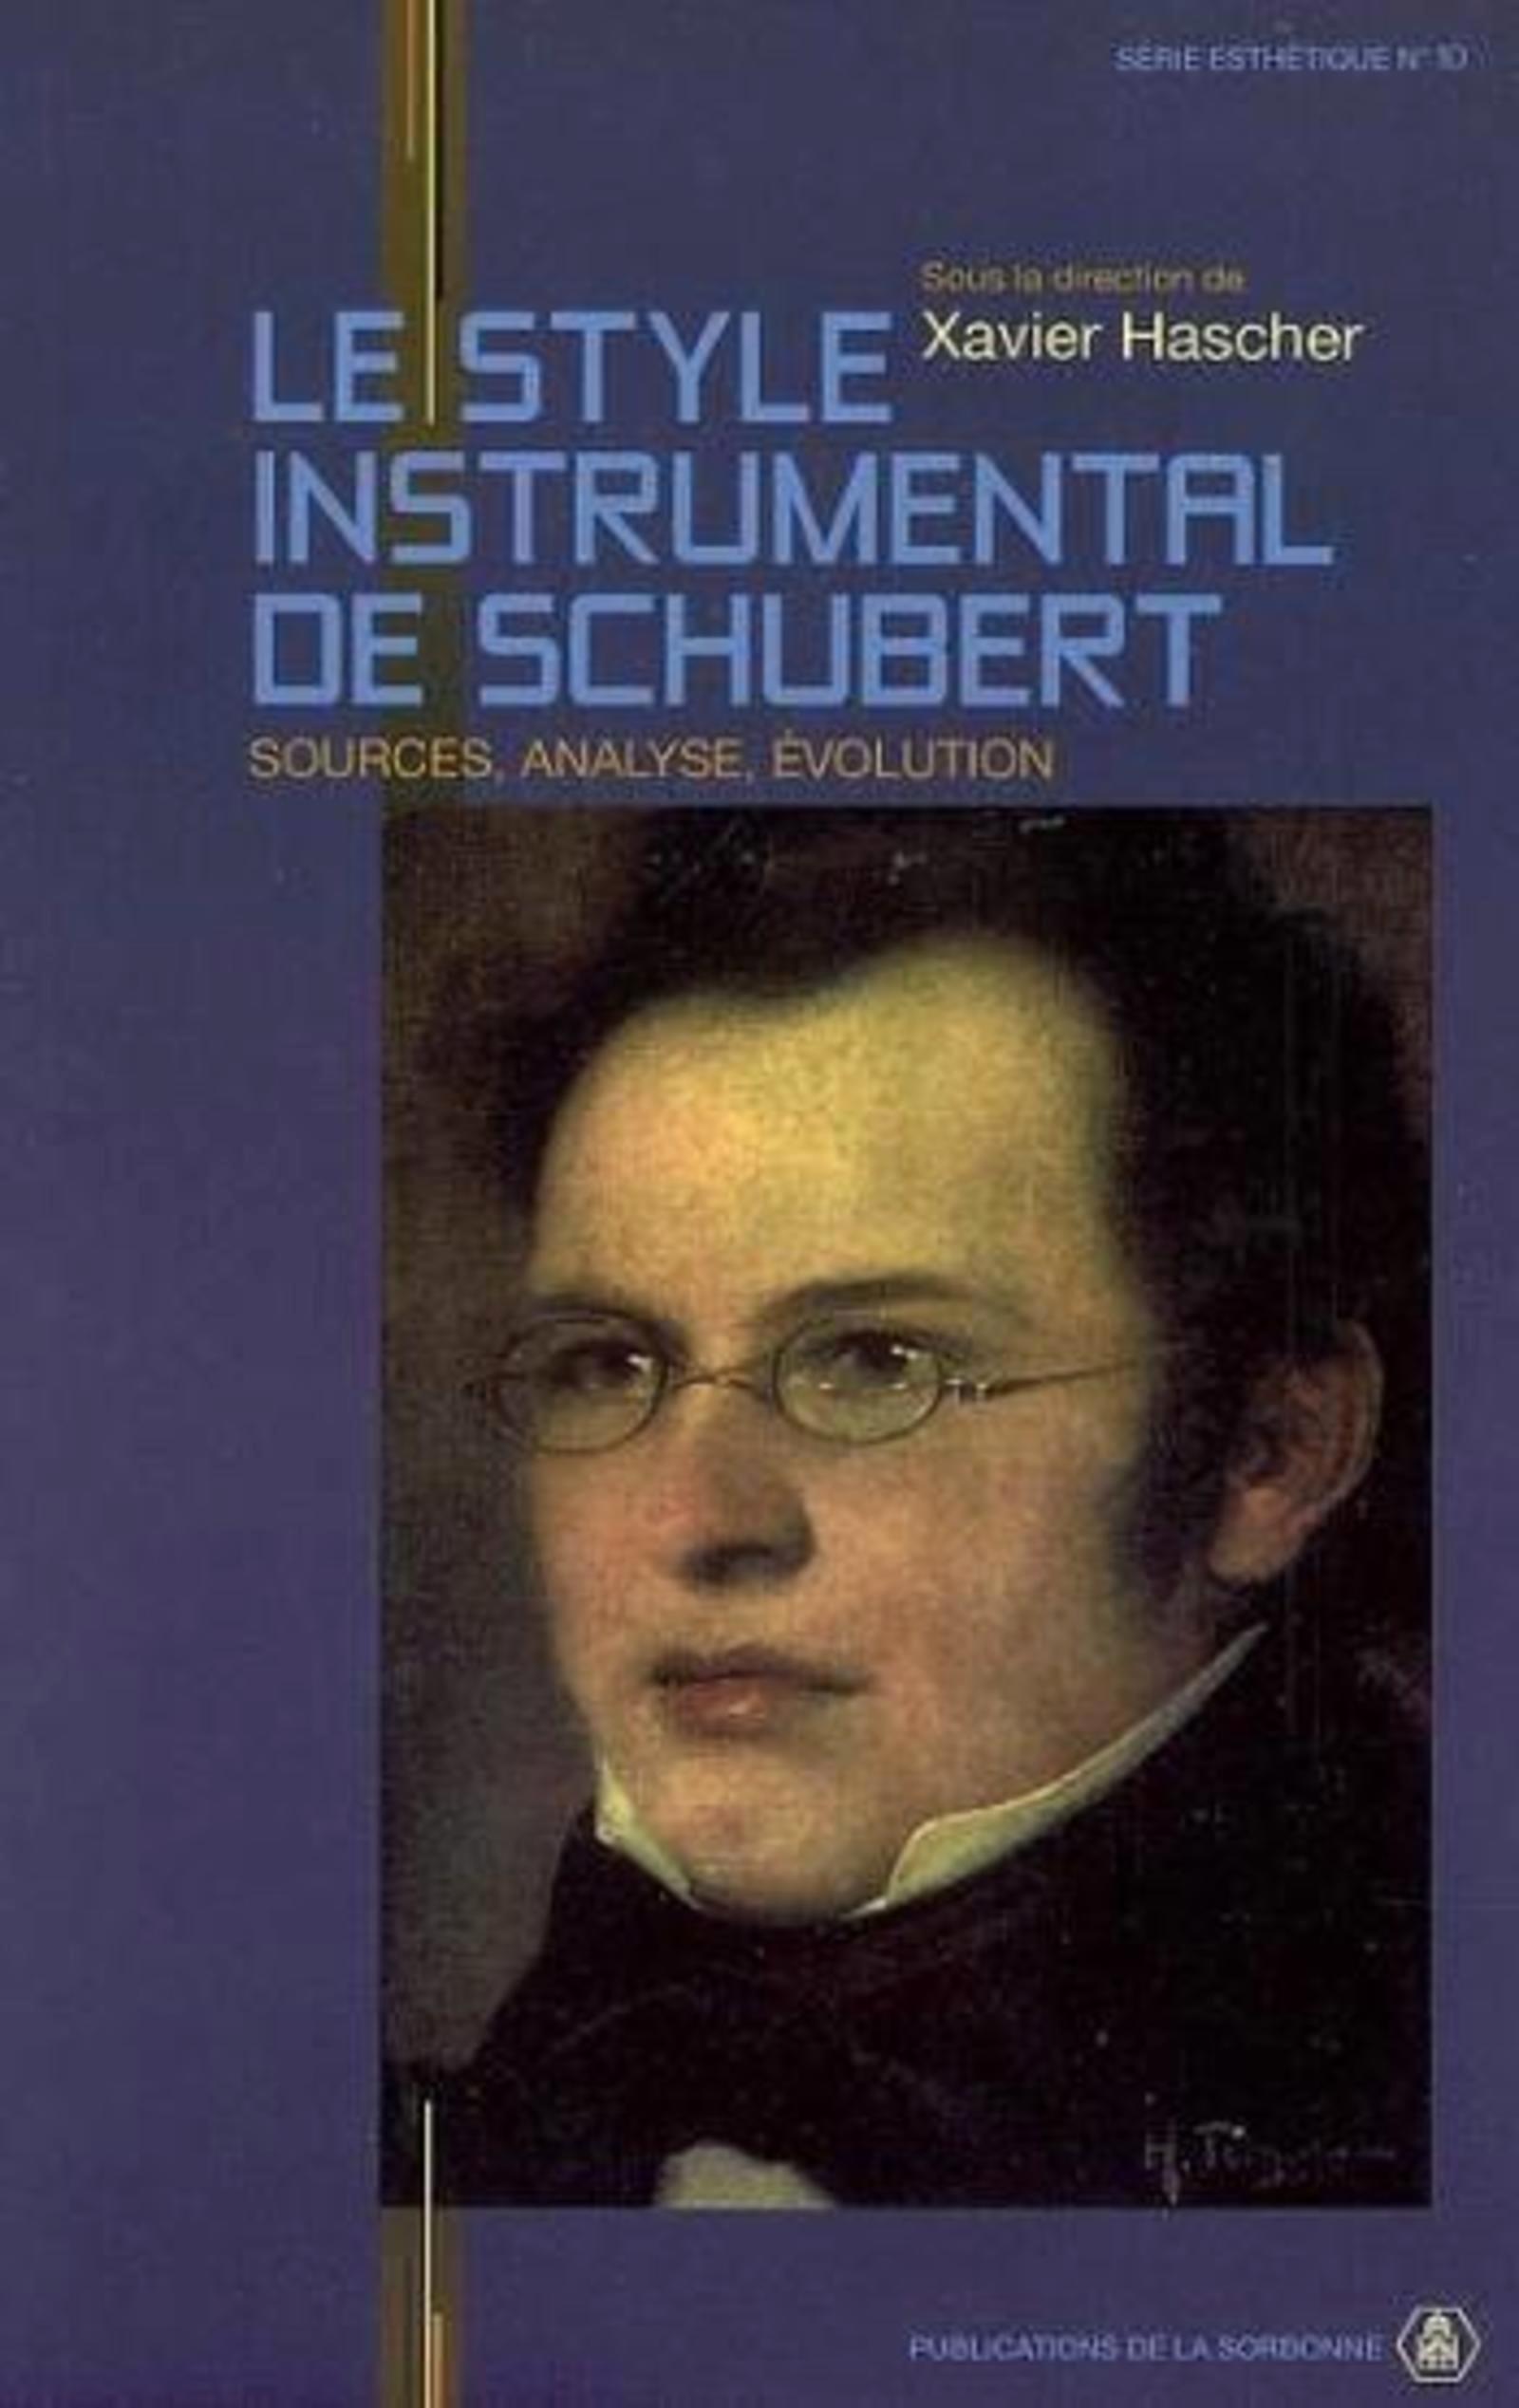 LE STYLE INSTRUMENTAL DE SCHUBERT SOURCES, ANALYSE, EVOLUTION